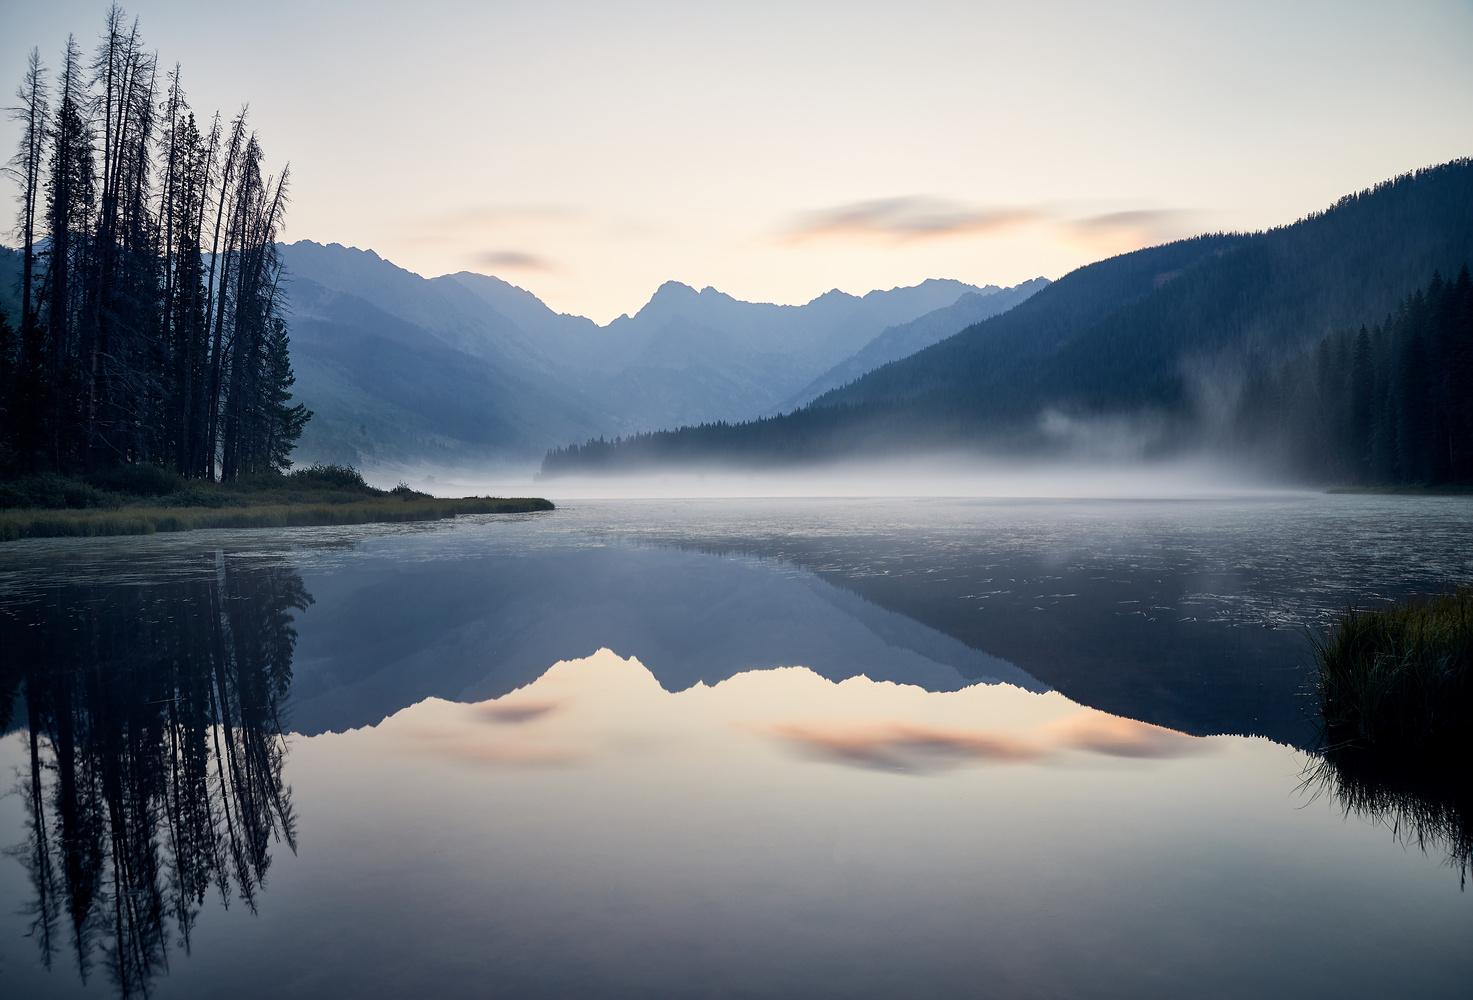 Colorado: Rising Mist on Piney Lake. by Sebastian Leonhardt